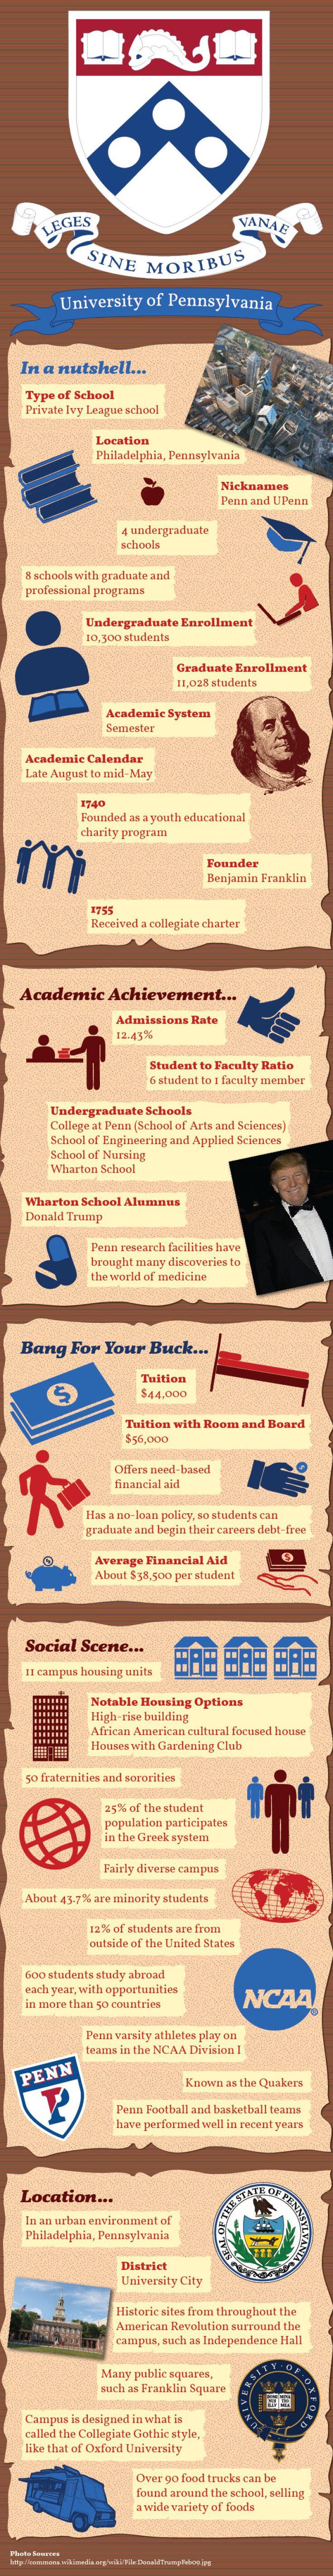 University of Pennsylvania Upenn Infographic